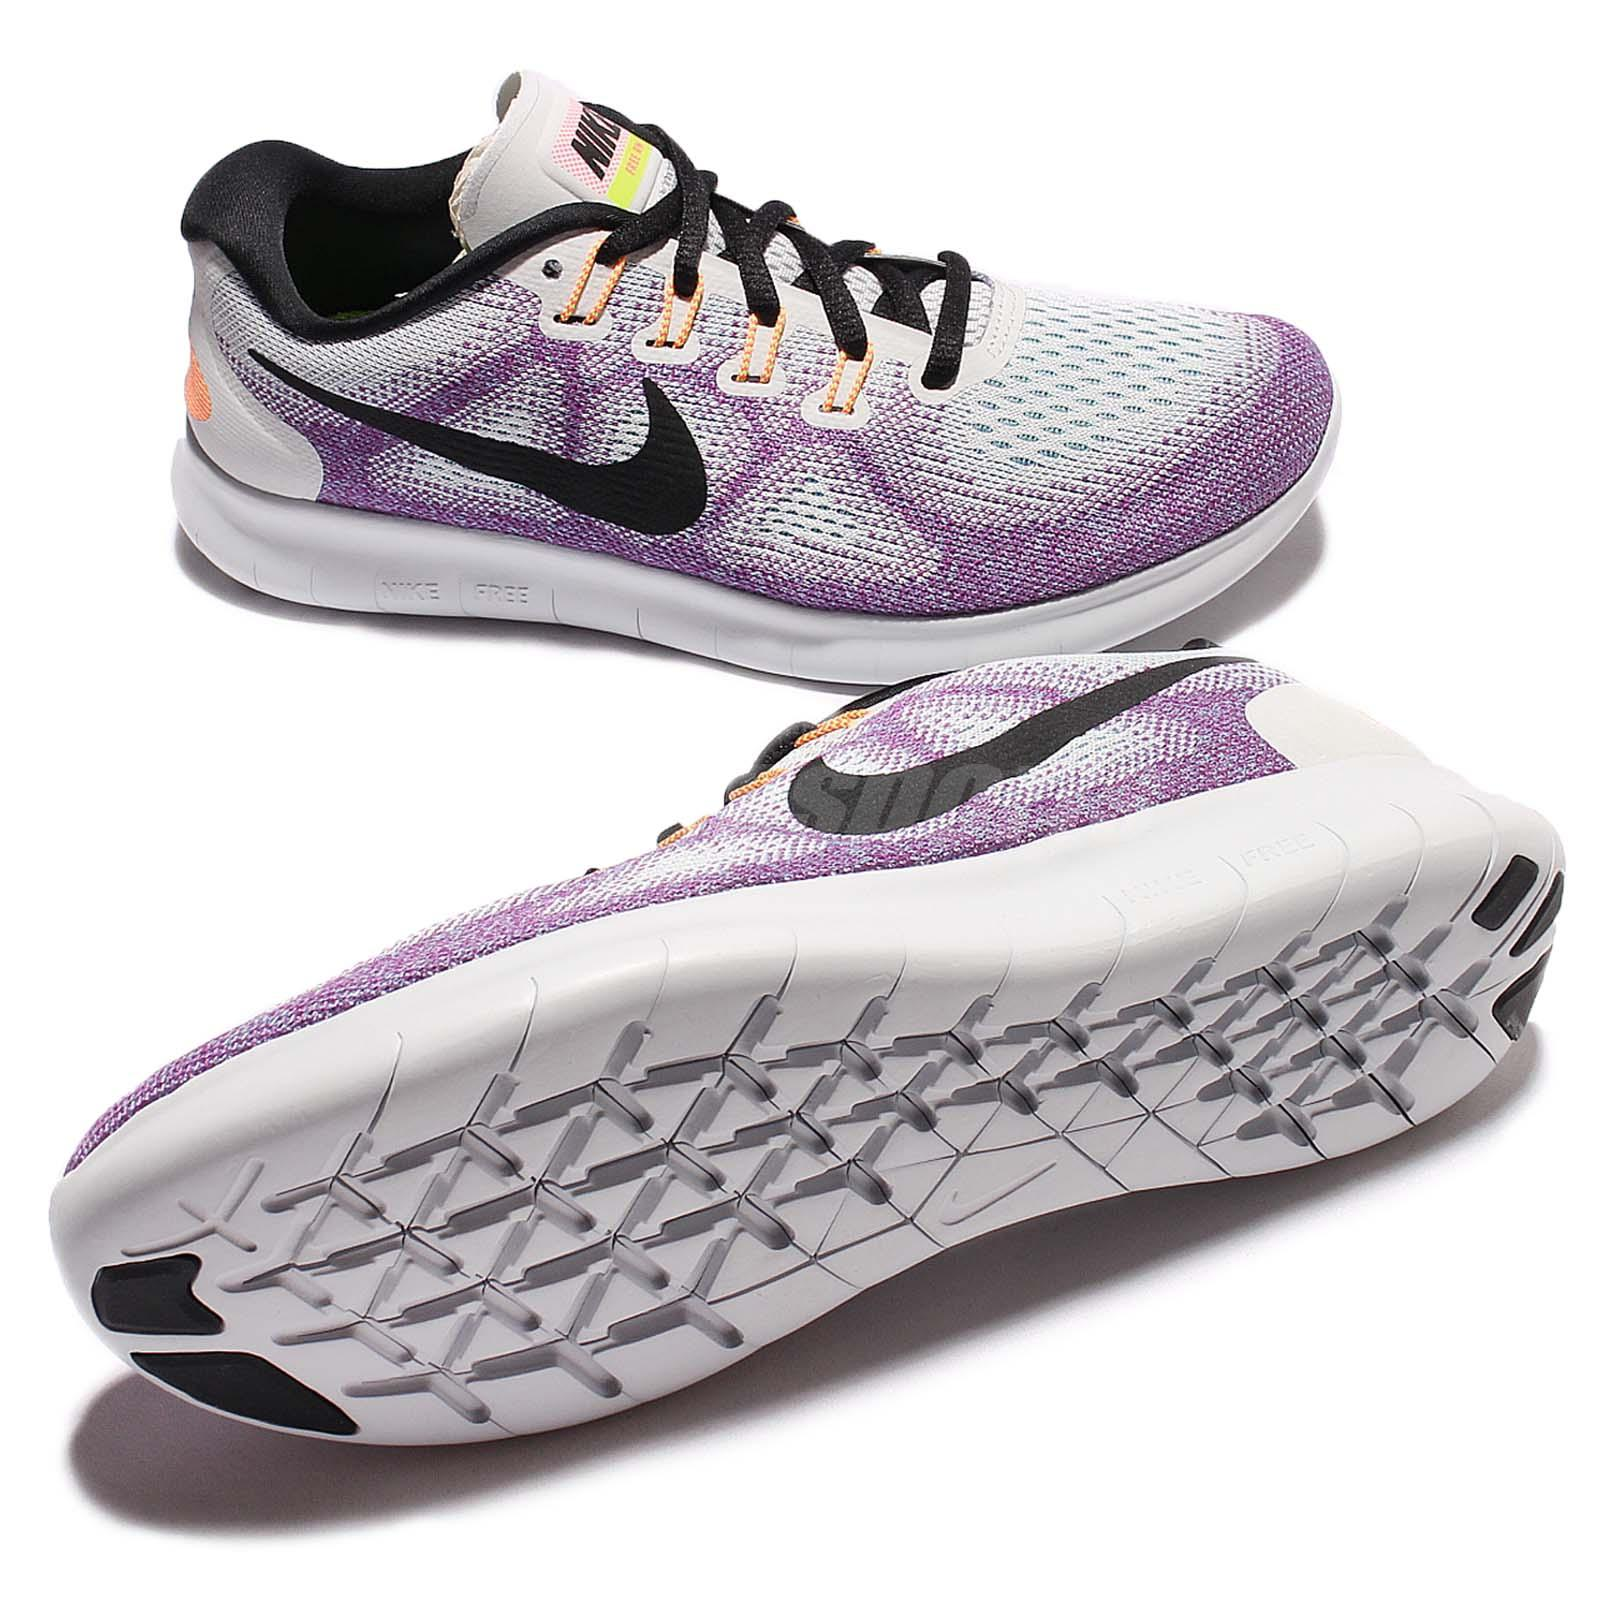 Buying Nike Shoes Off Amazon